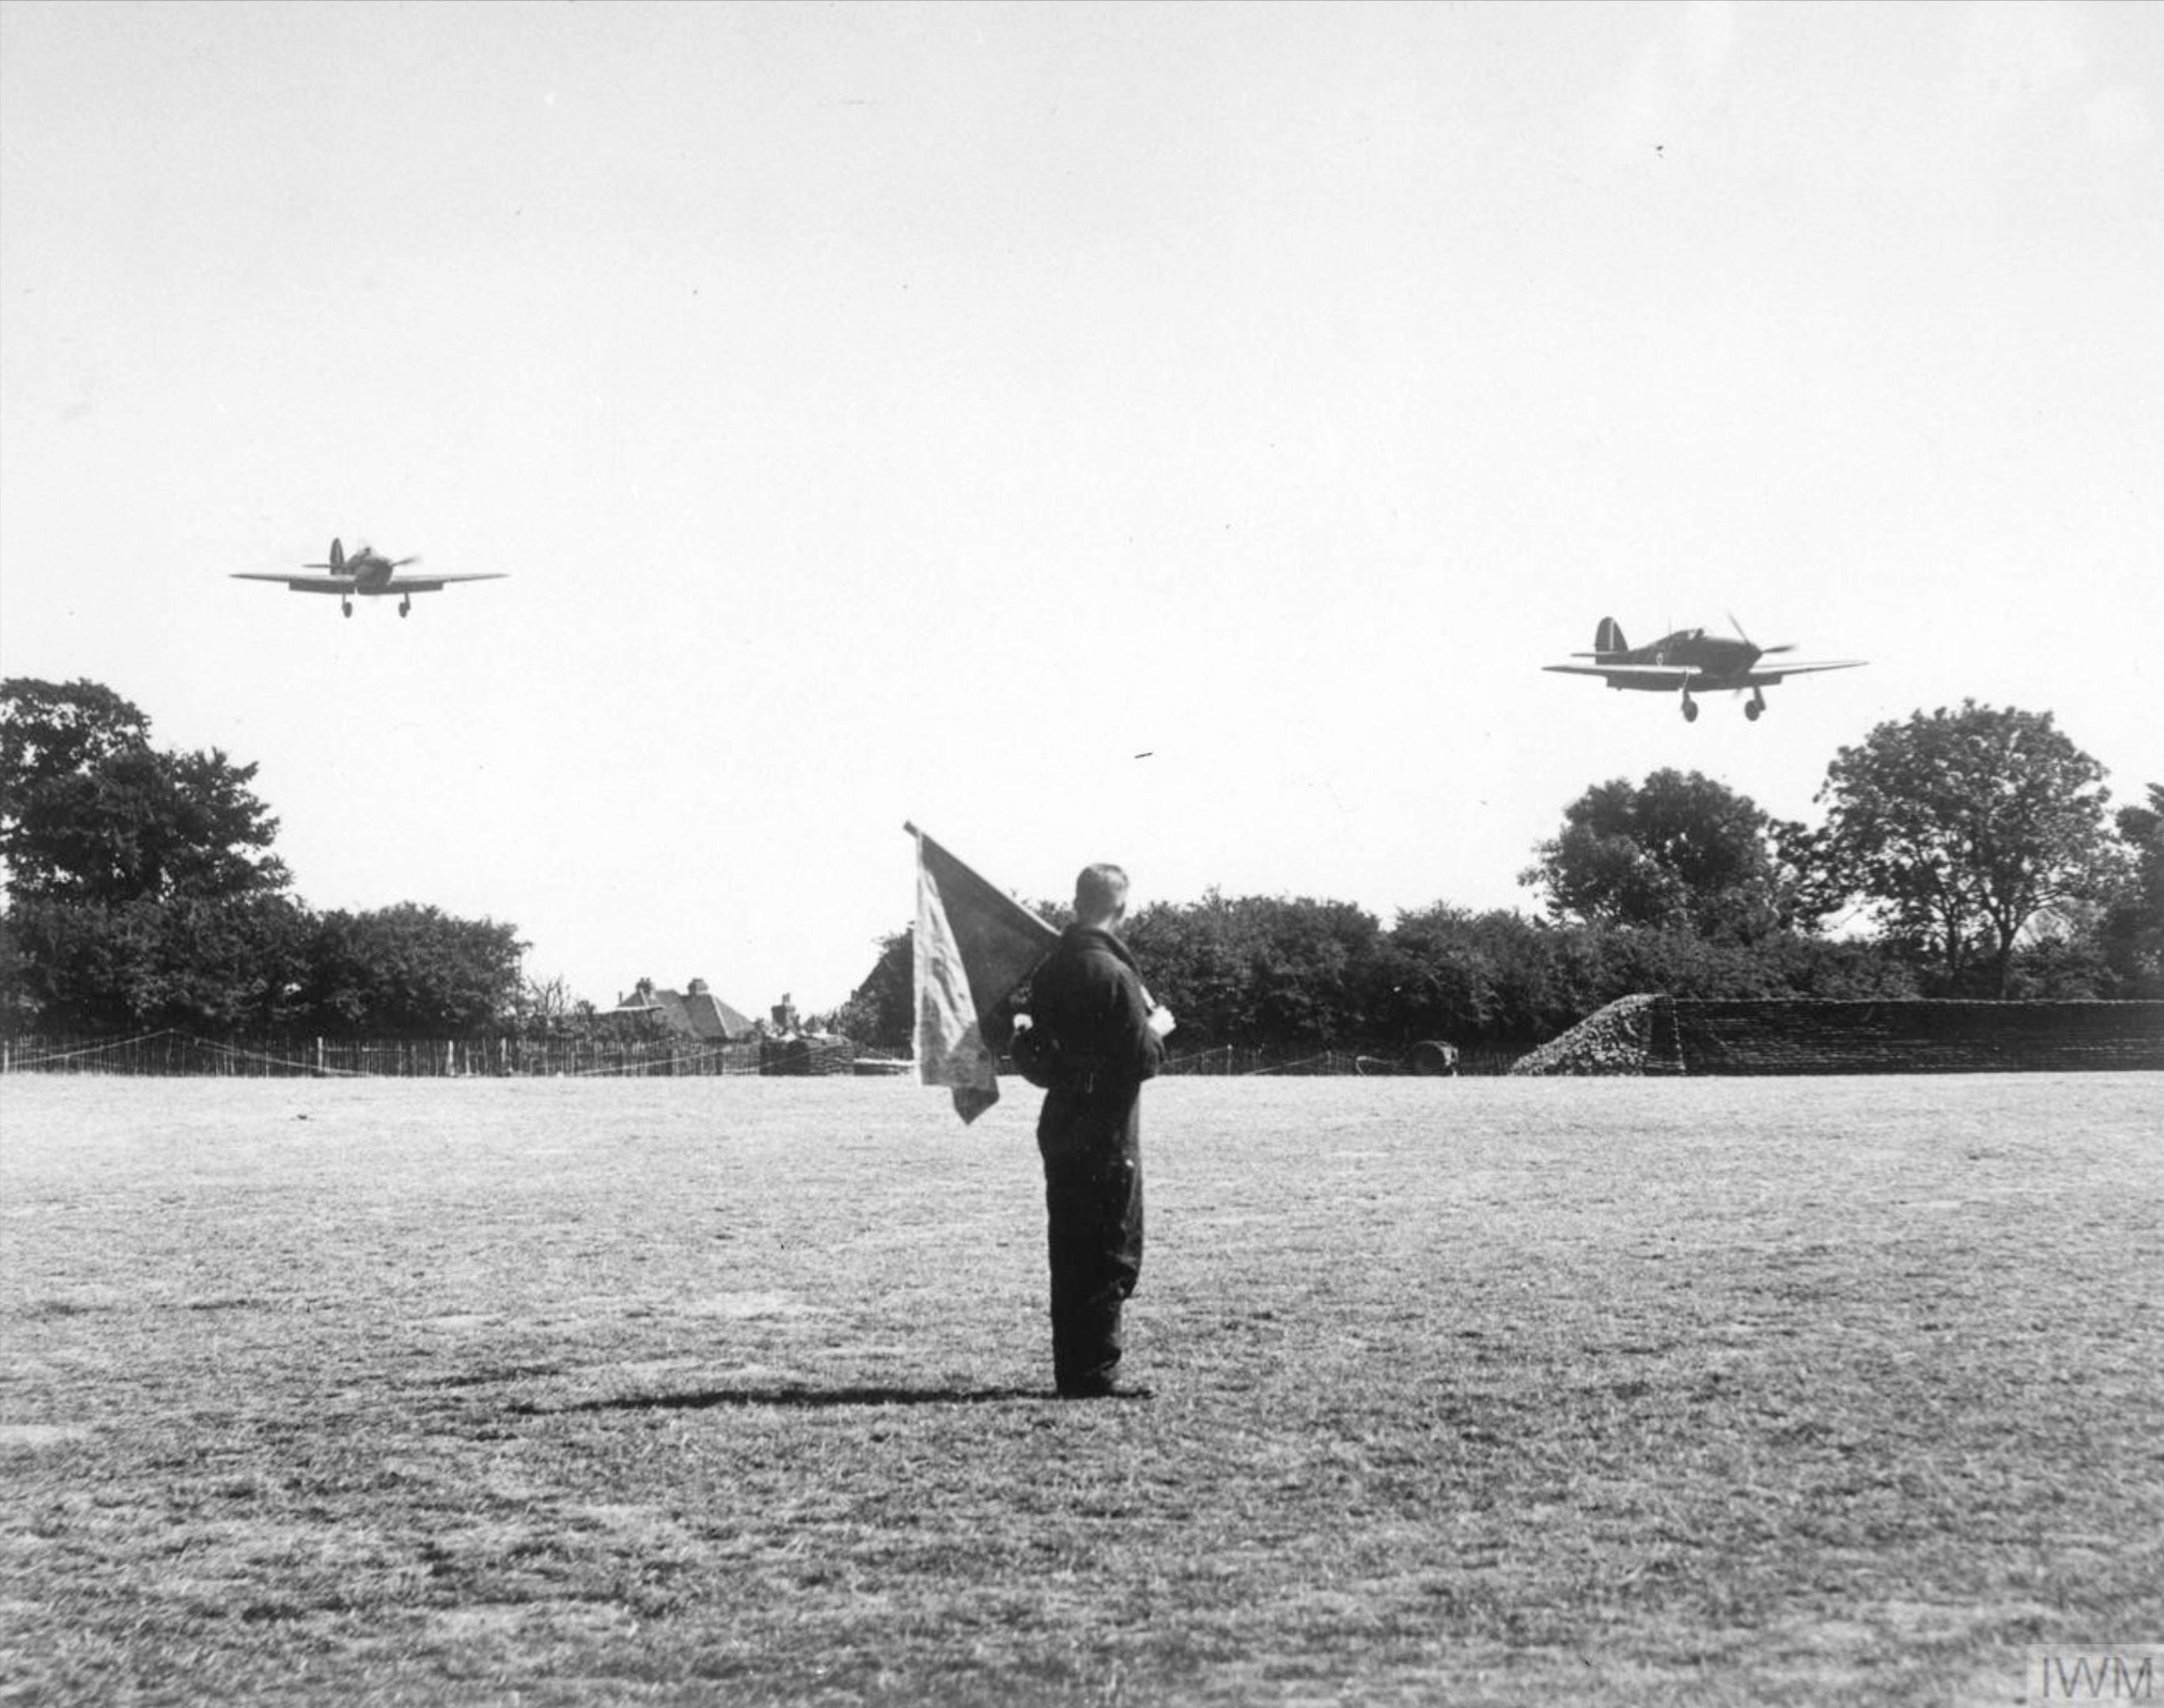 Hurricane I RAF 32Sqn GZZ landing at Biggin Hill England Aug 1940 IWM HU54519A